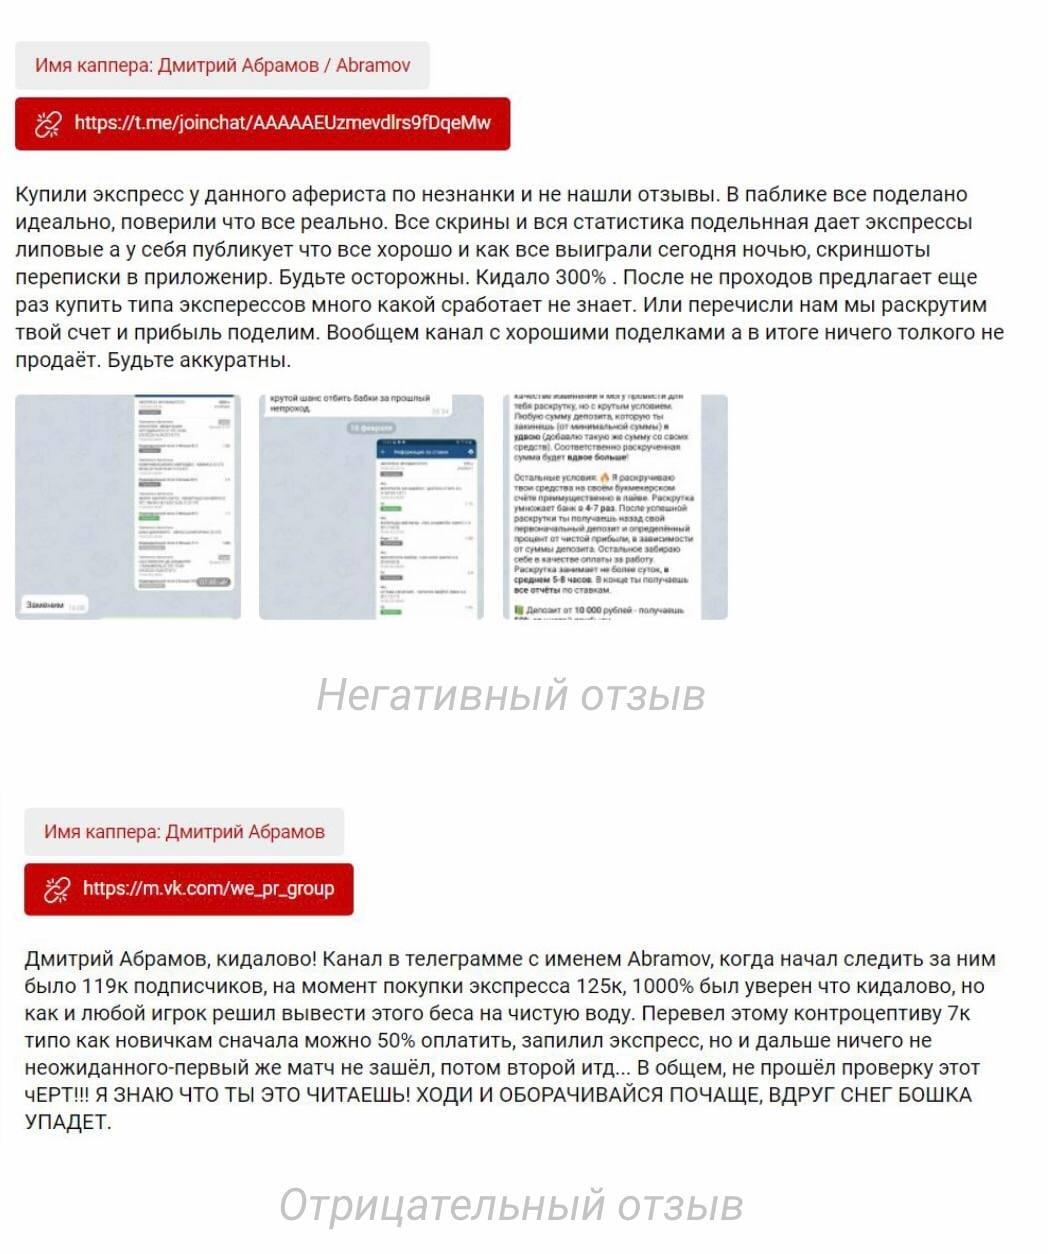 Каппер Дмитрий Абрамов Телеграмм – отзывы